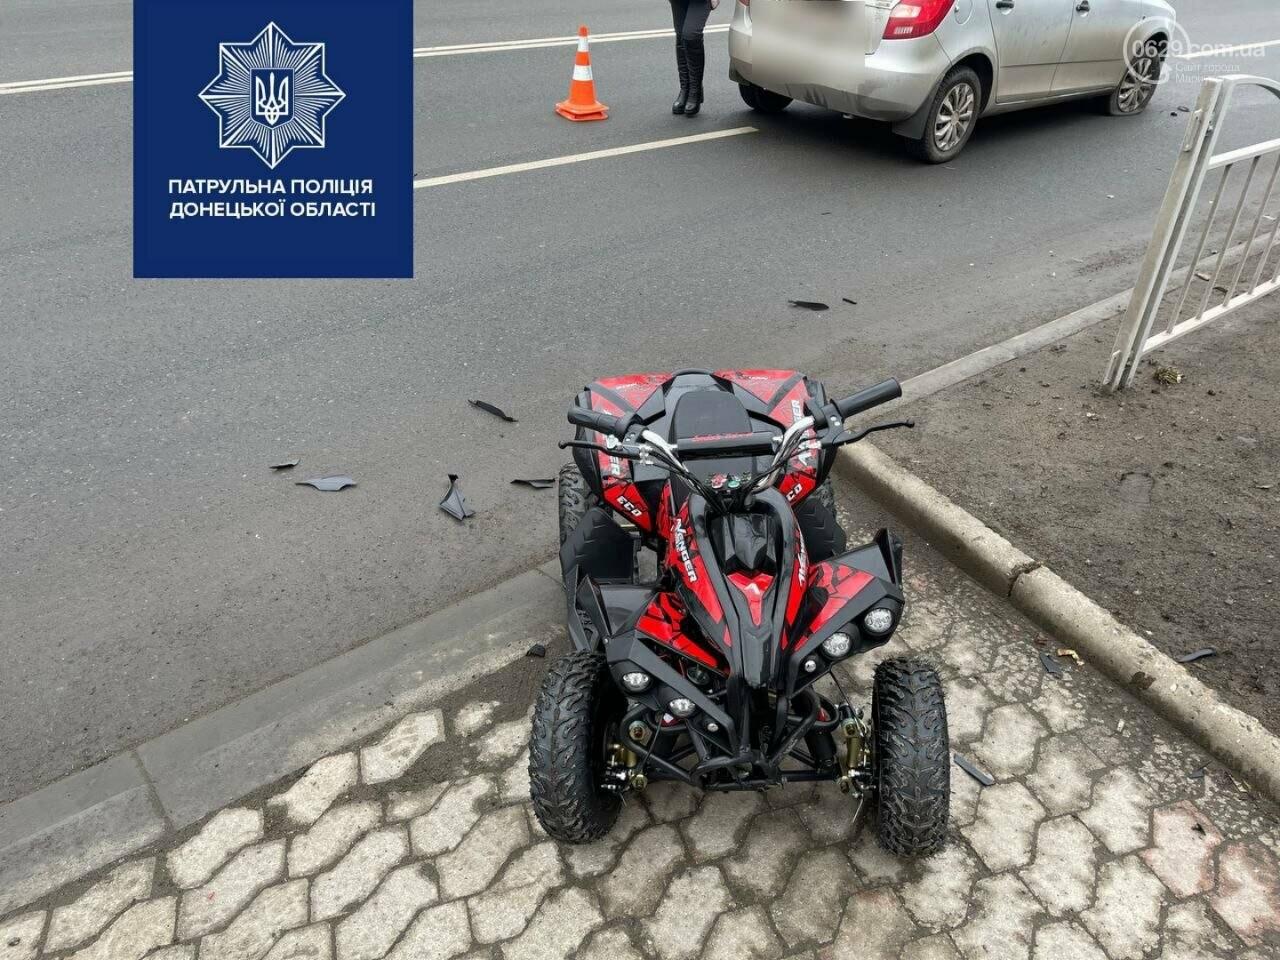 В Мариуполе ребёнок на квадроцикле попал под  колеса авто,- ФОТО, фото-3